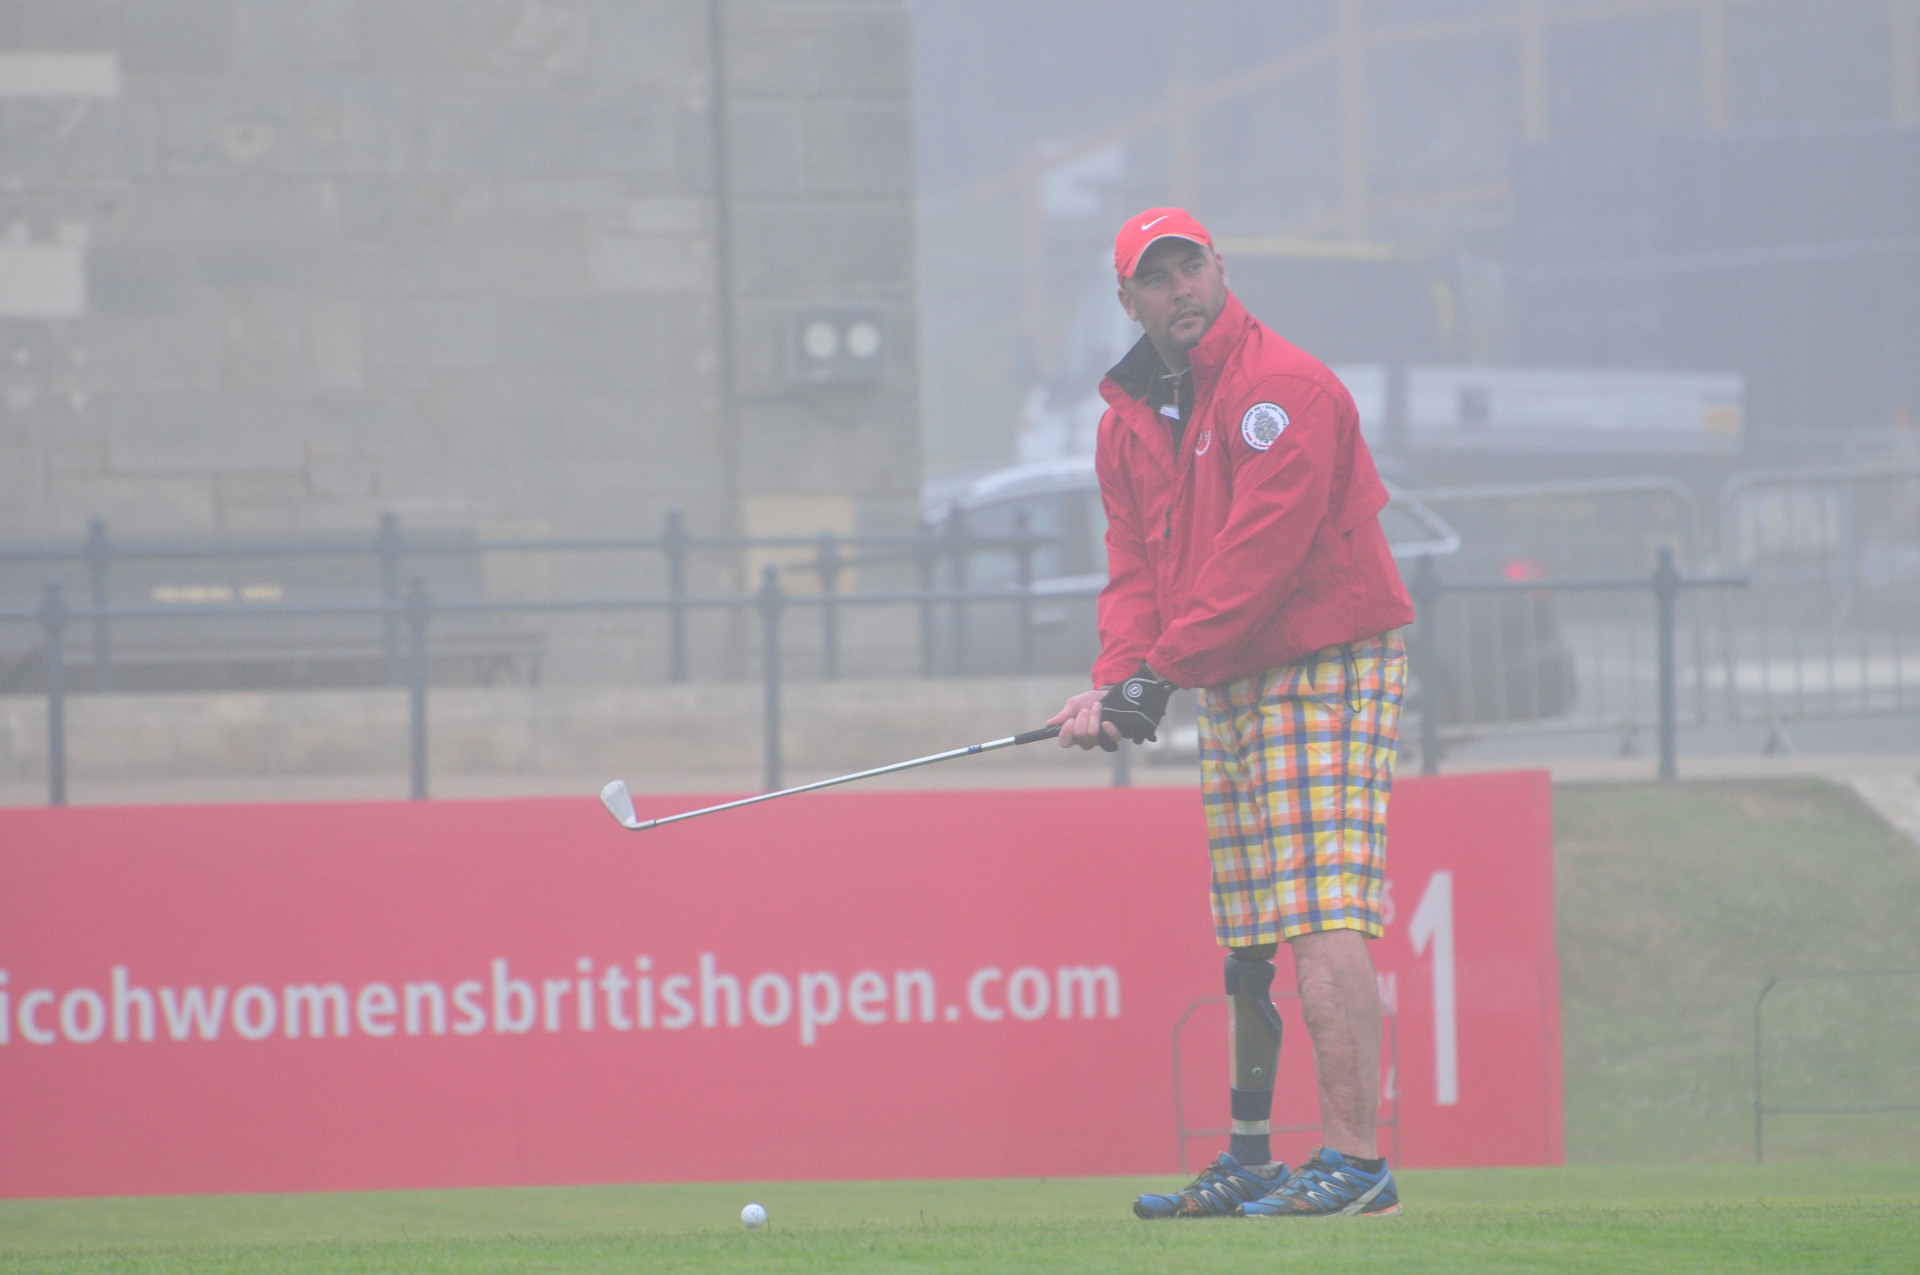 Veteran Golf